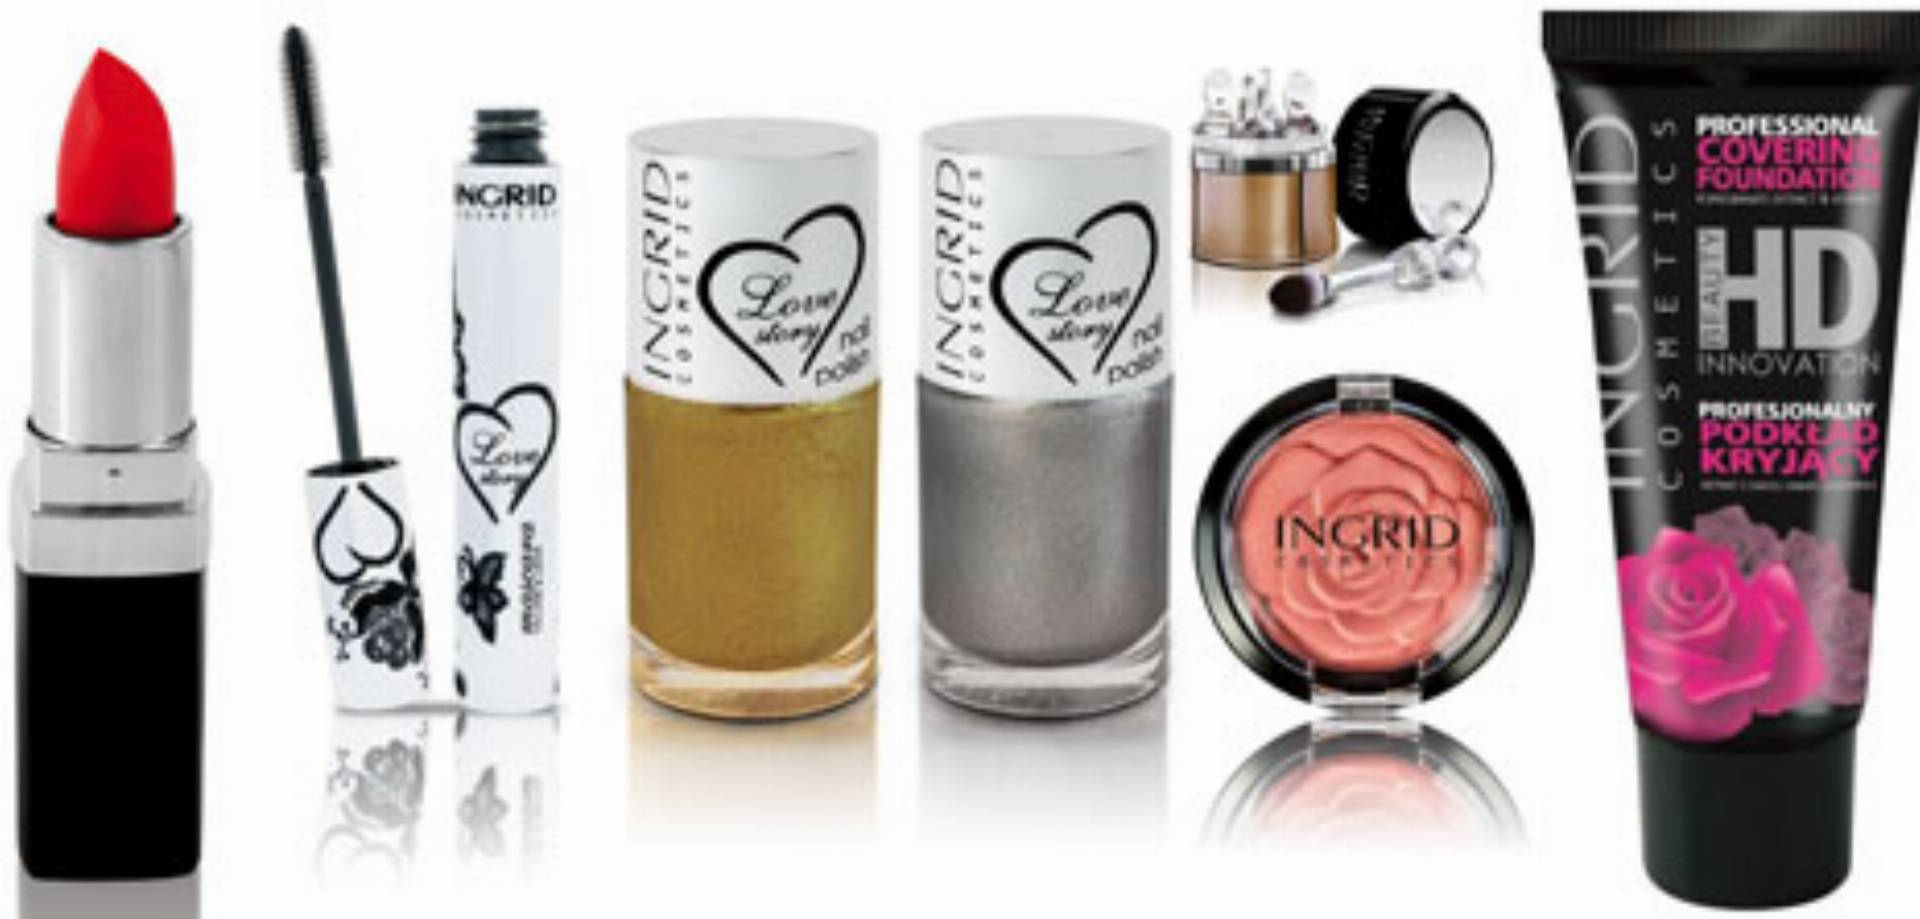 Kosmetyki Ingrid Cosmetics